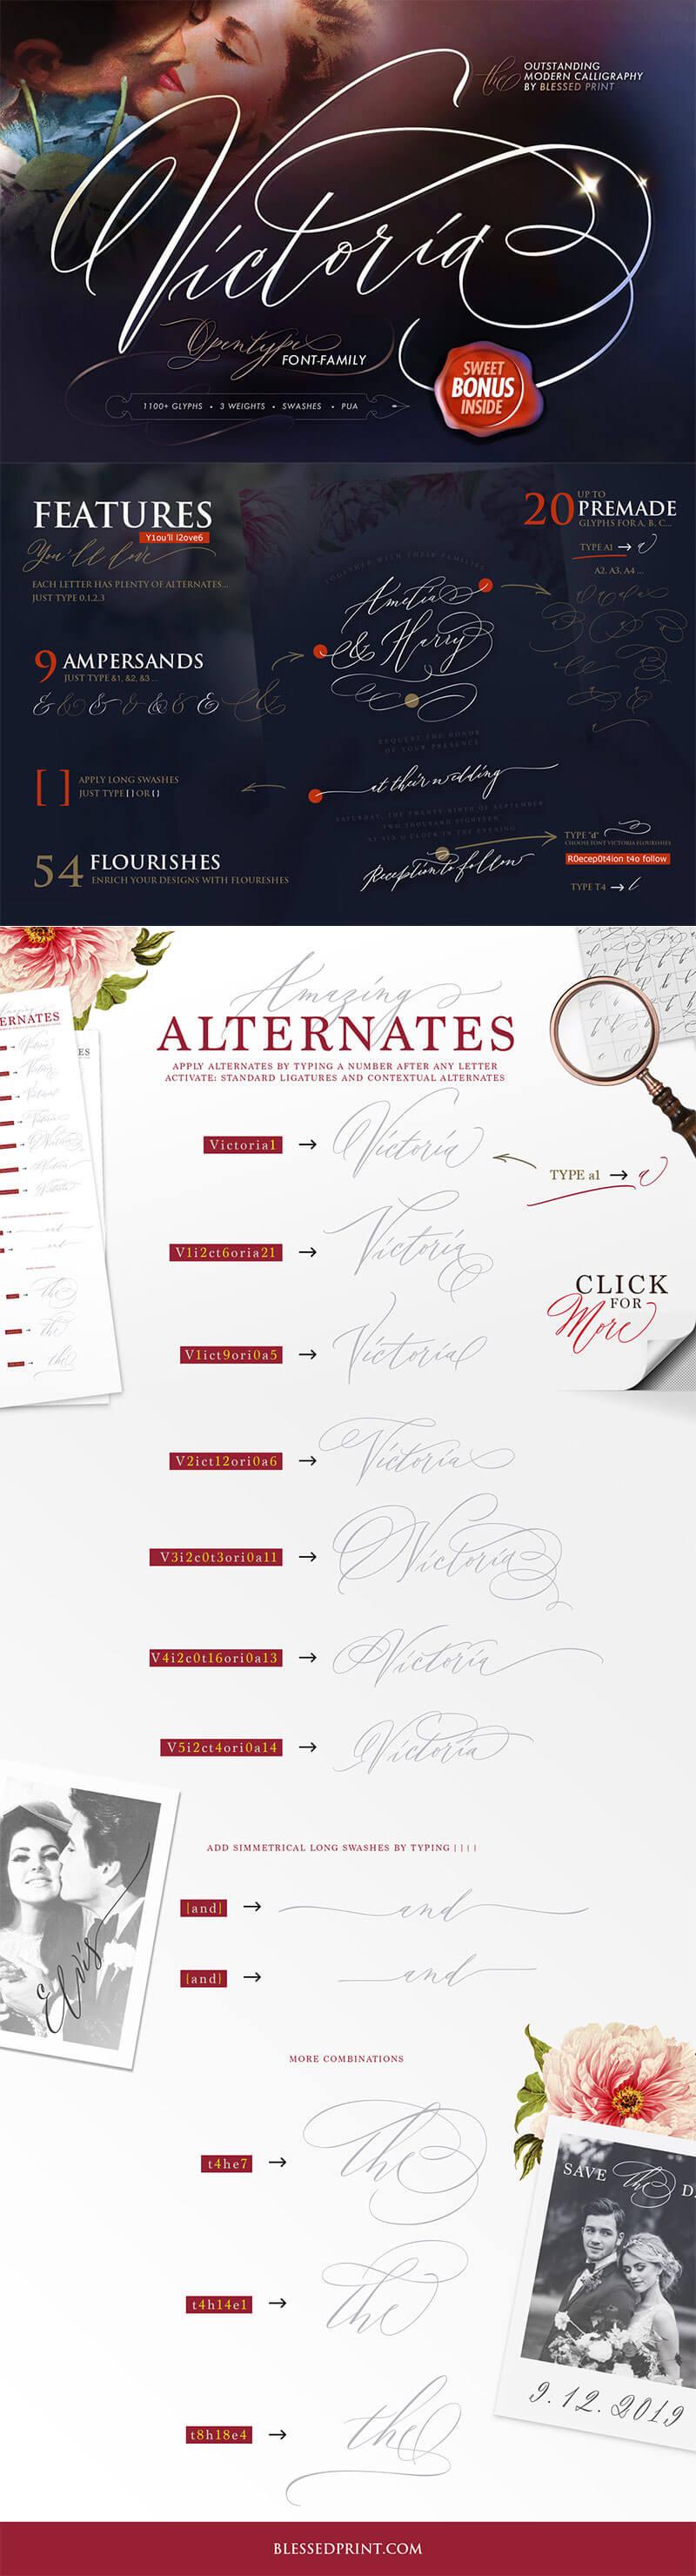 all-purpose-creatives-kit-004-a